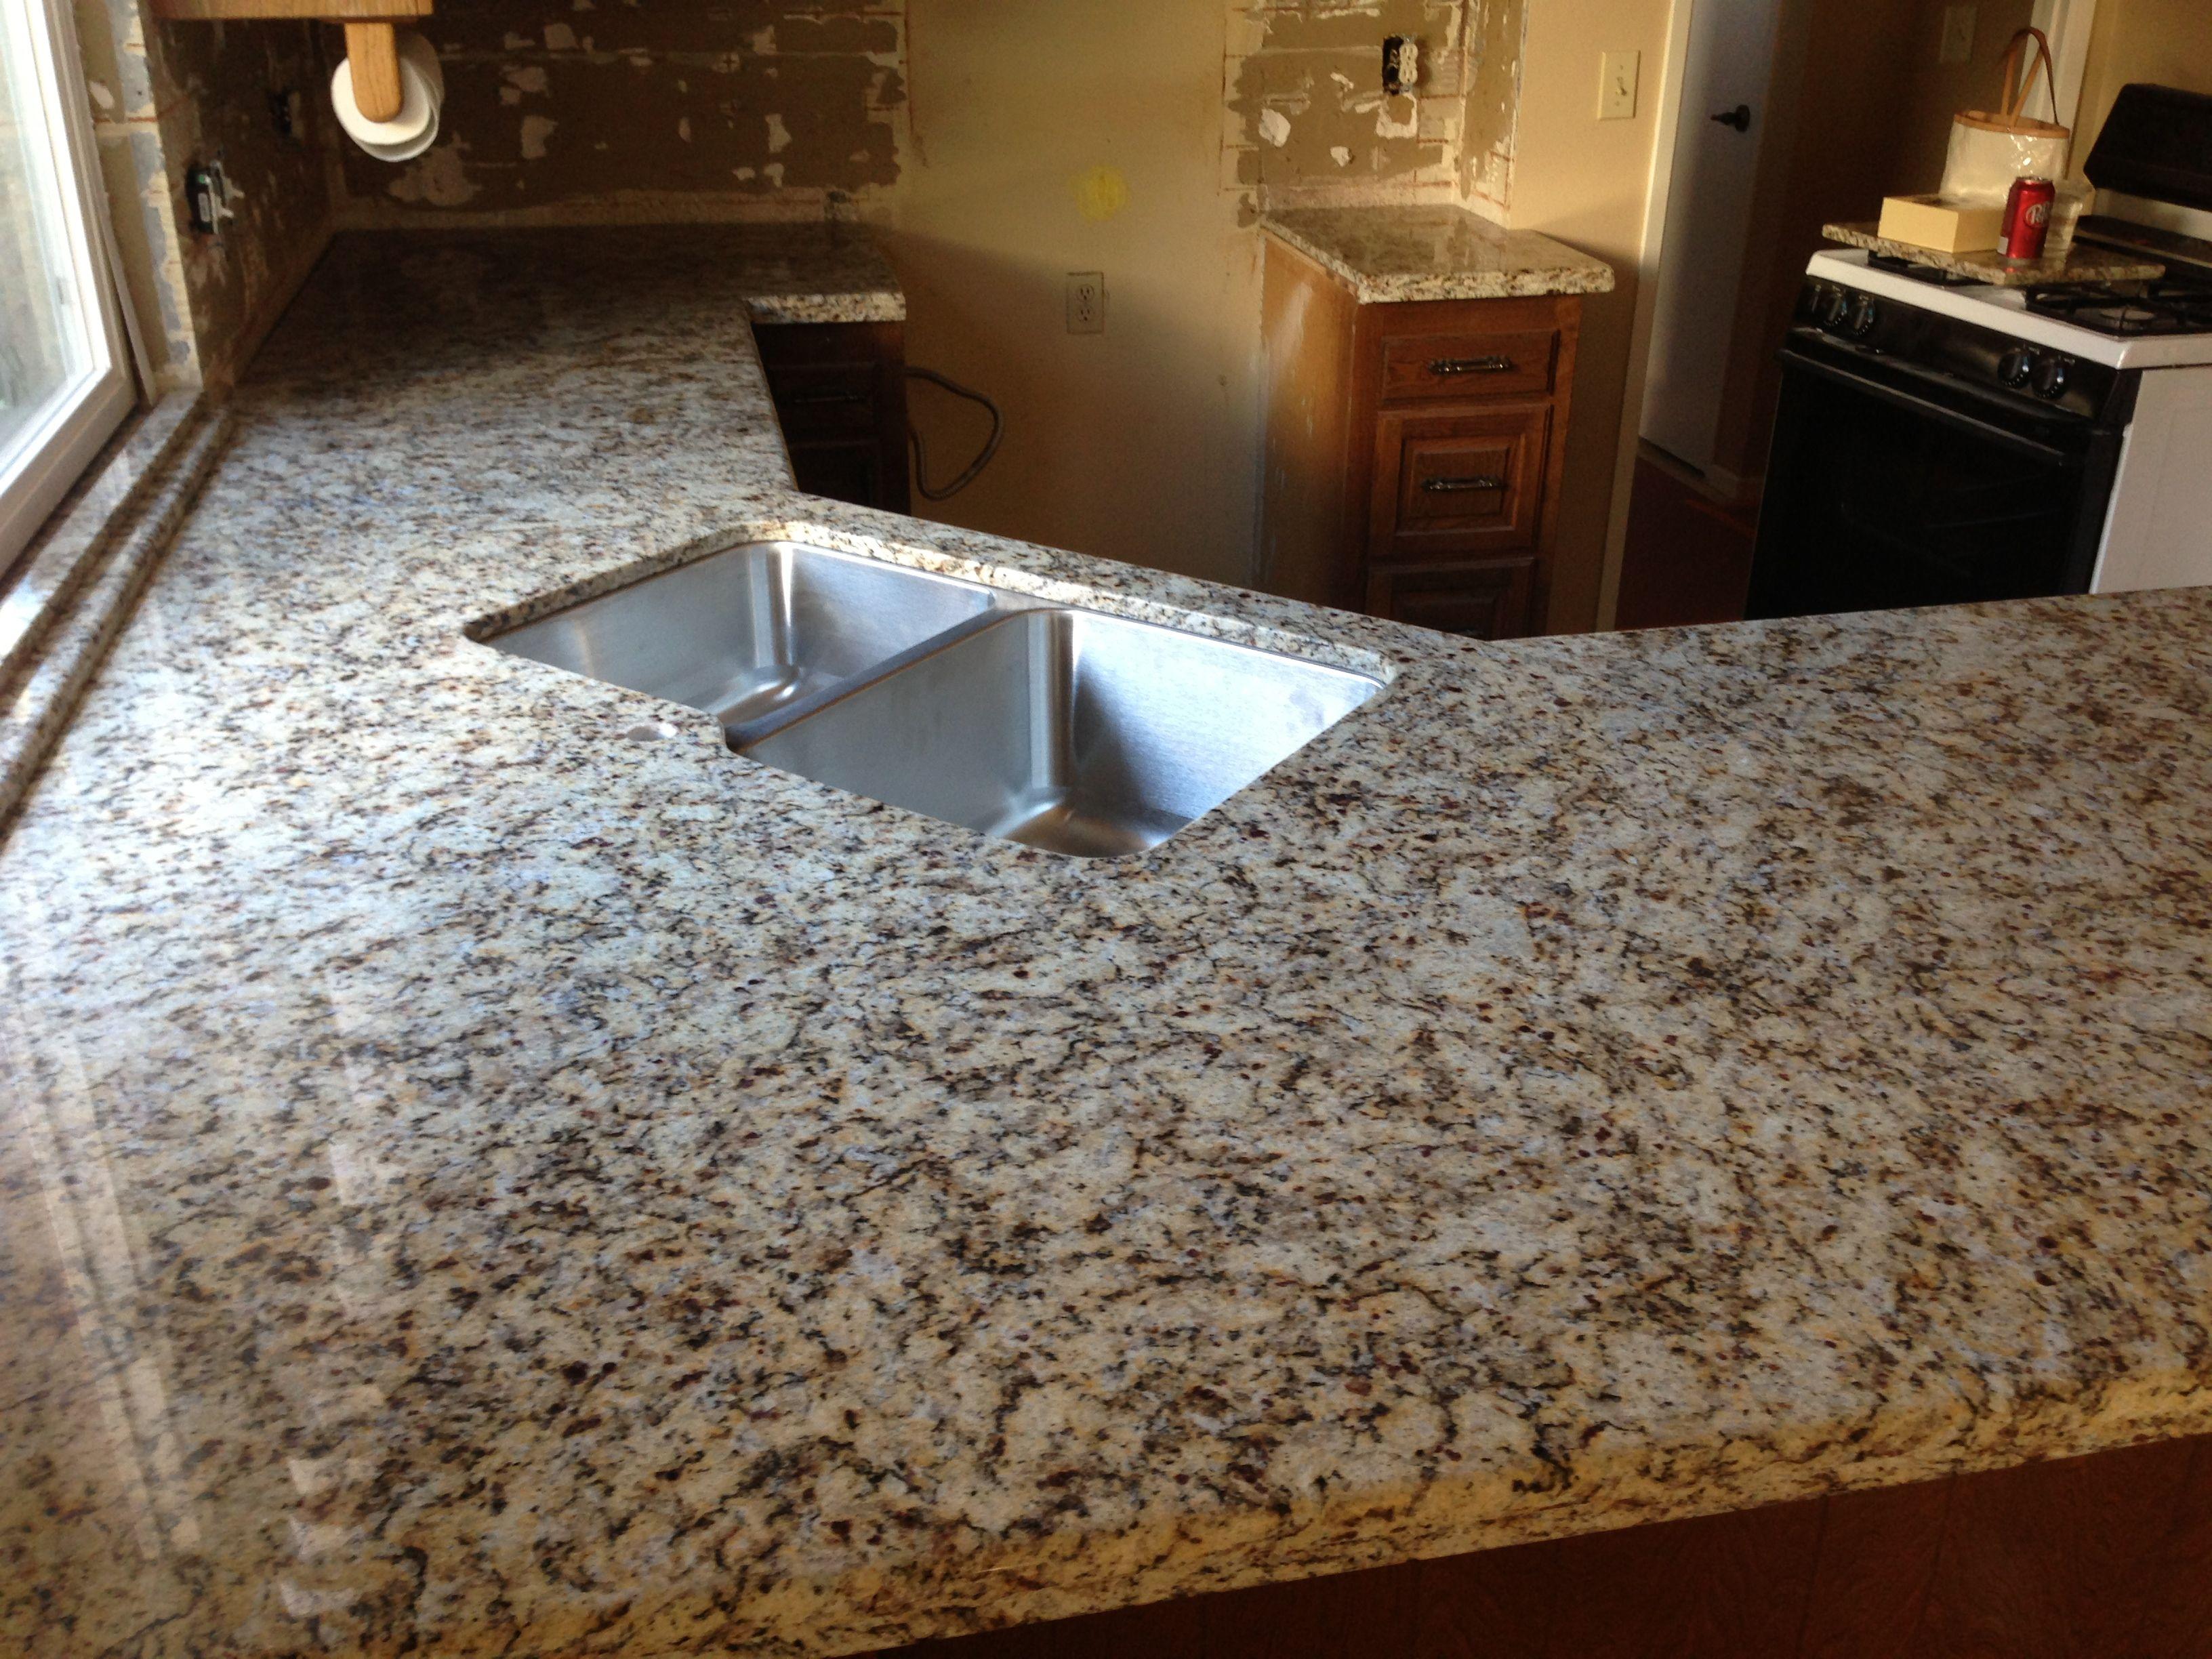 New Granite Countertop Installed Giallo Napoli Tumbled Travertine To Be Installed On Backsplash With Images Granite Countertops Granite Countertops